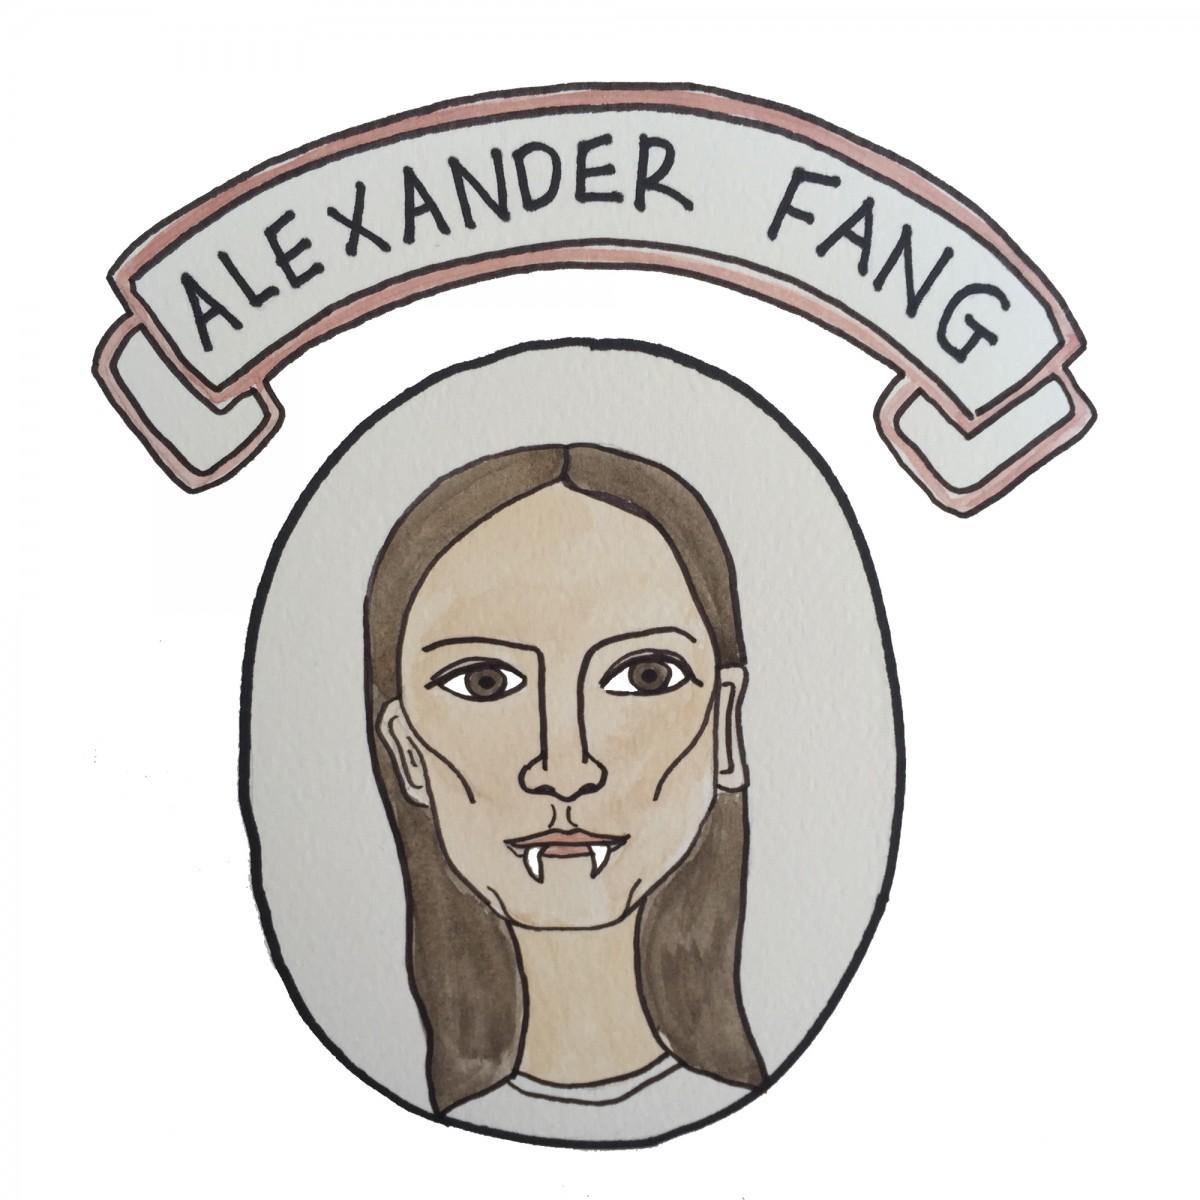 alexanderfang